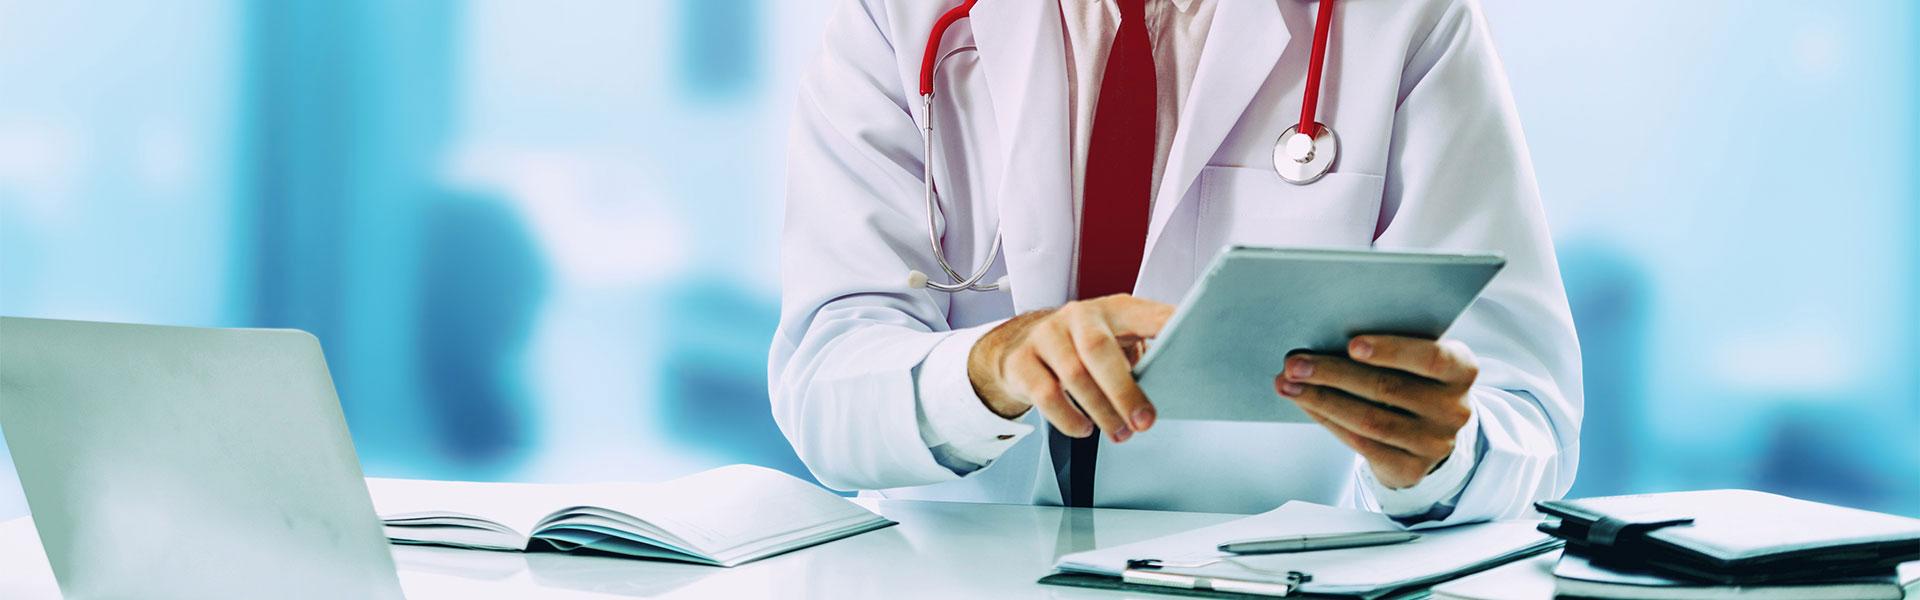 International Standardised System for Cytopathology Reporting